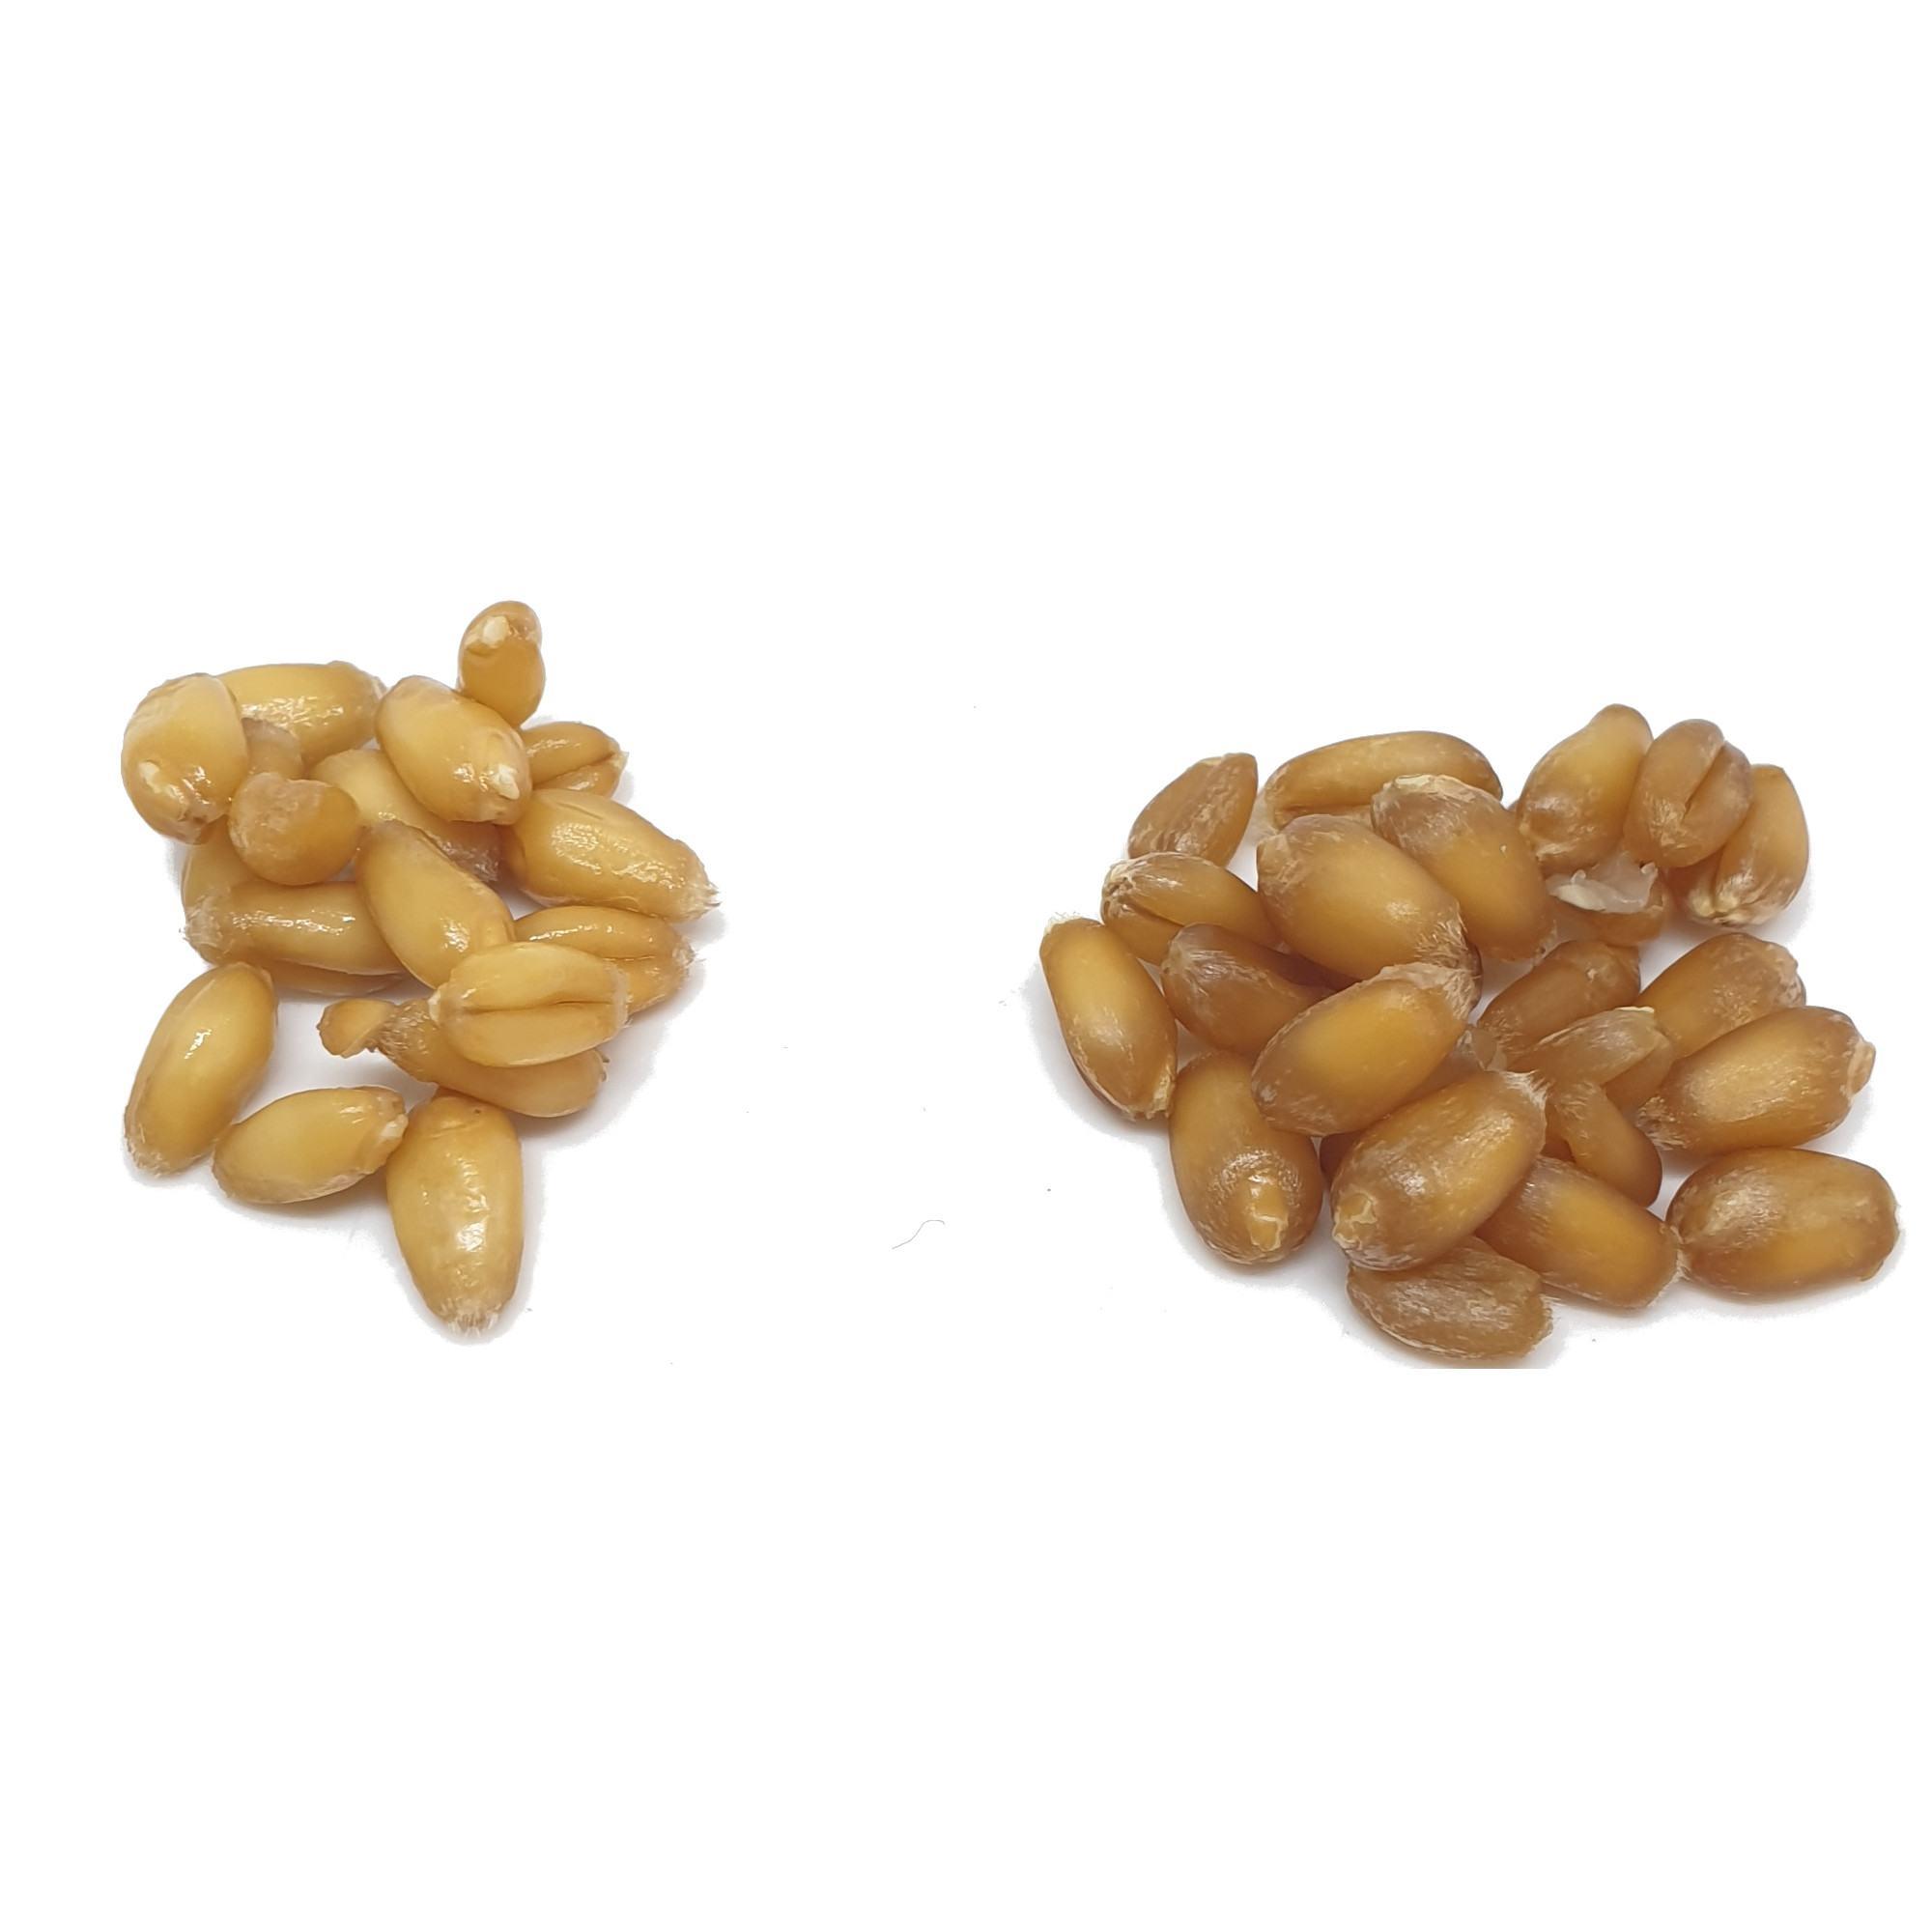 Simple Grain Spawn | Mushroom Grain Spawn | How to Make Mushroom Grain Spawn | Wheat Berry Spawn | Archers Mushrooms | Mushroom Blogs | Mushroom Growing | Mushroom Tips | Mushroom Business